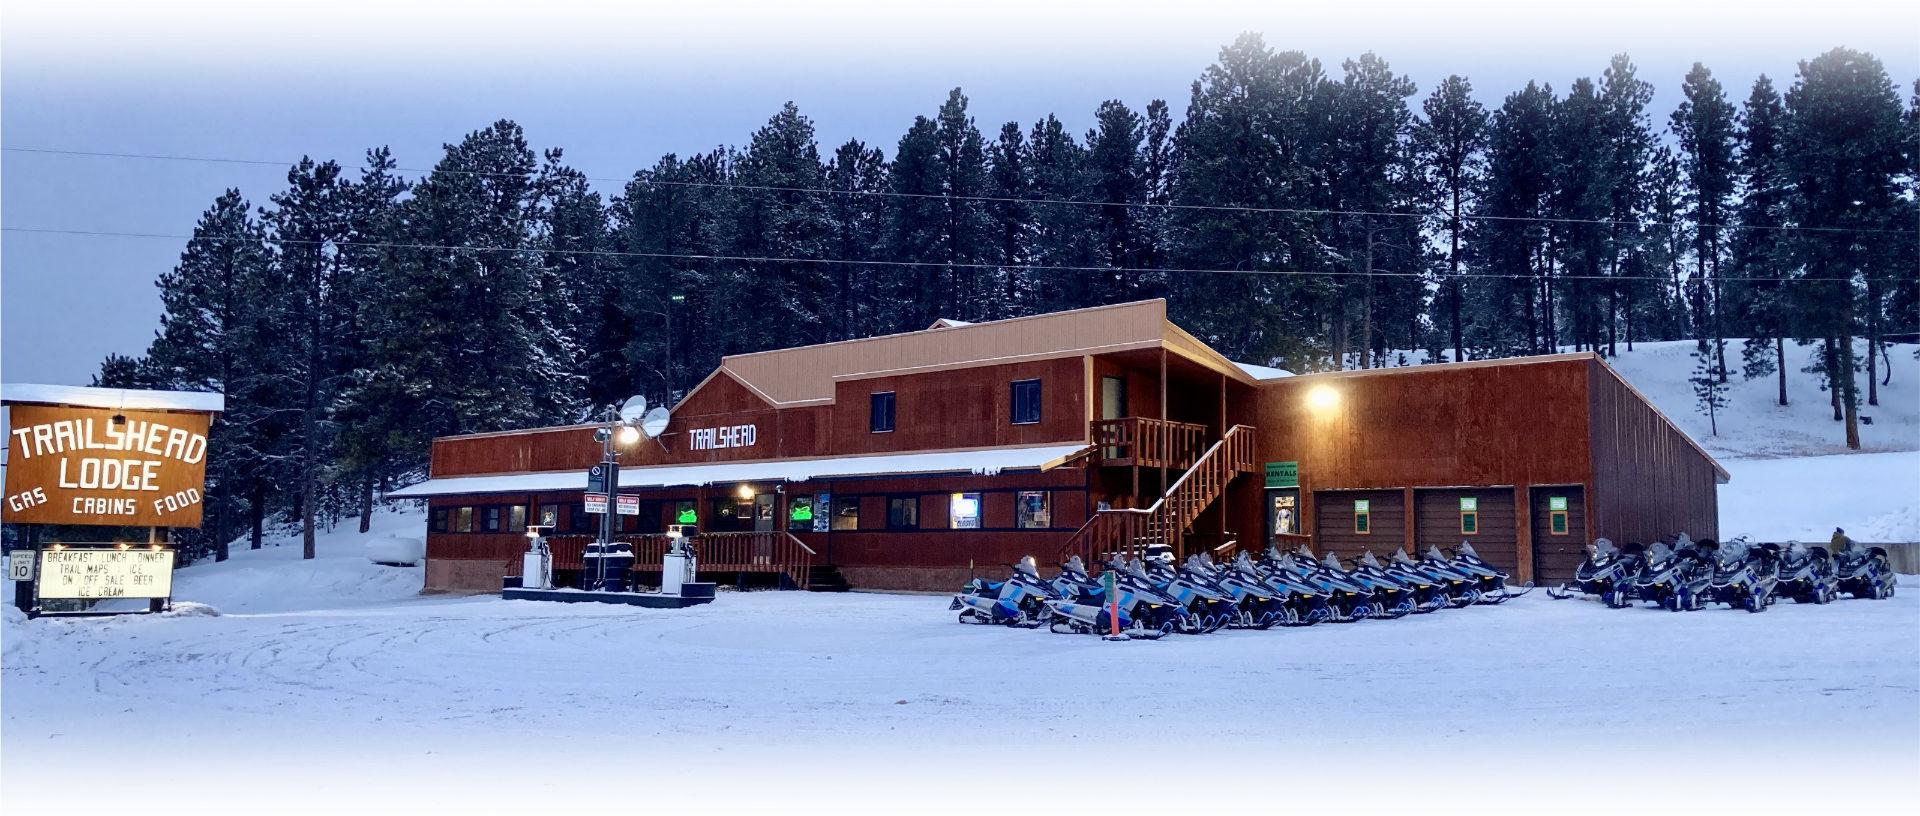 Trailshead Lodge Snowmobile